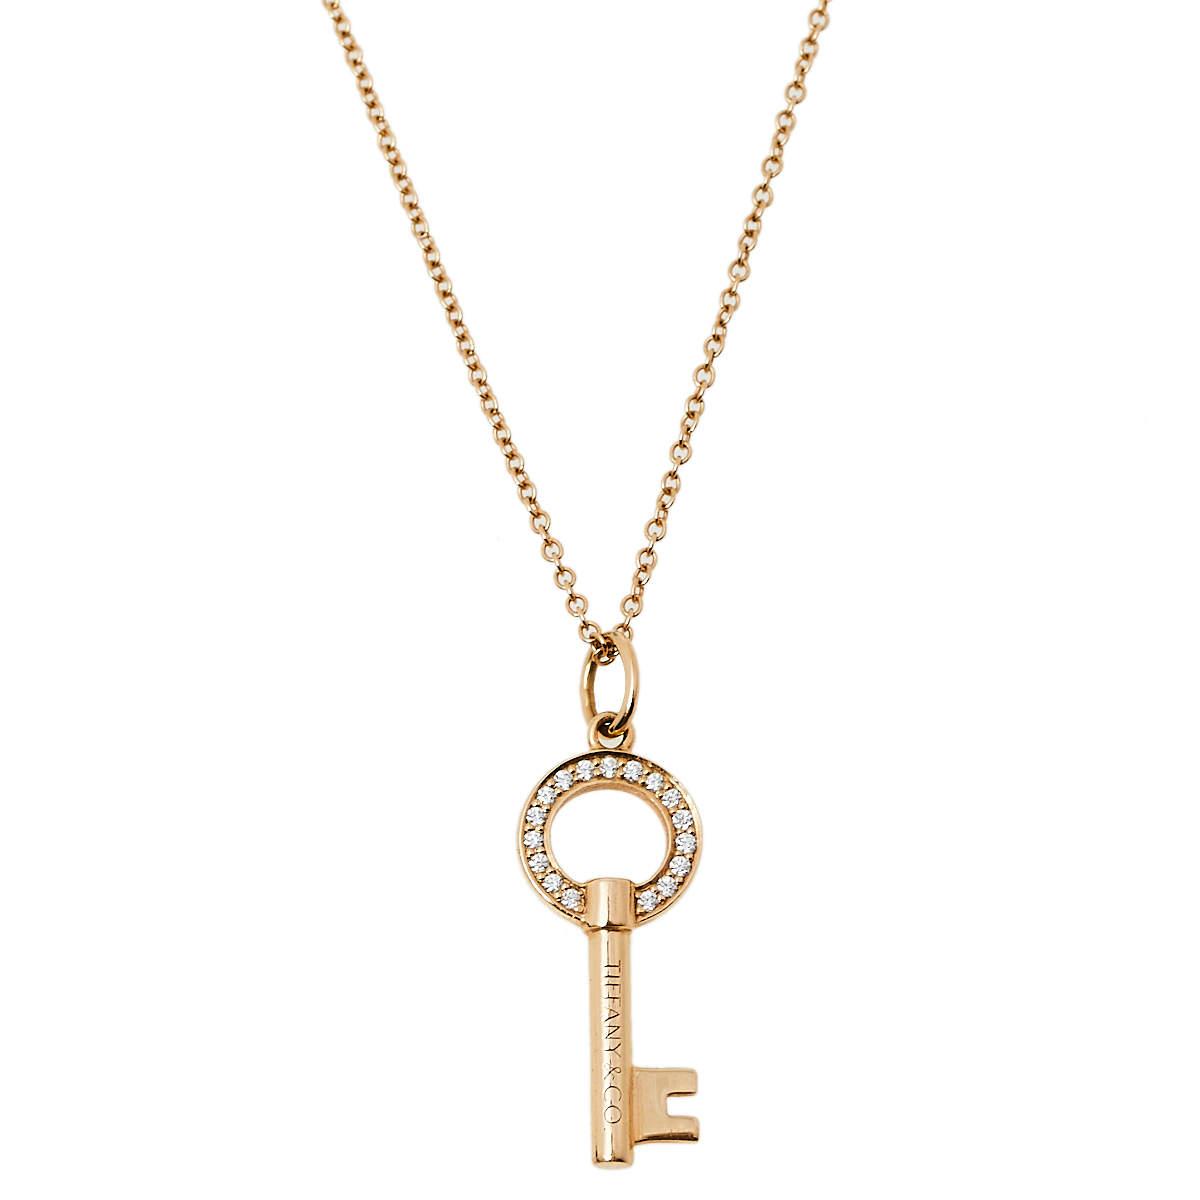 Tiffany & Co. Tiffany Keys Modern Open Round Keys Diamond 18k Gold Pendant Necklace